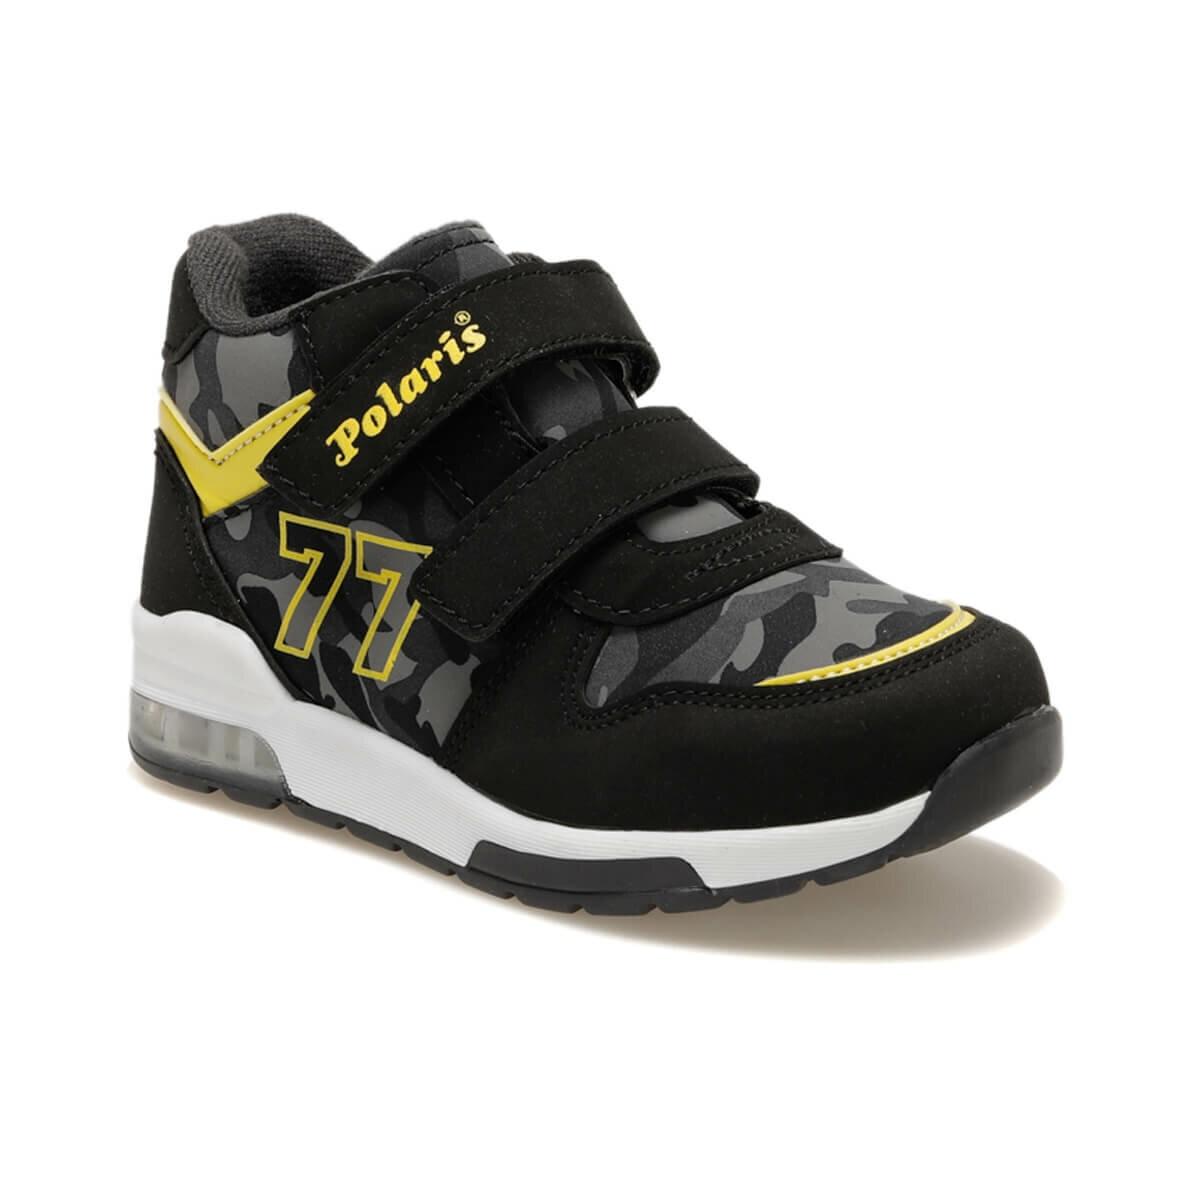 FLO 92. 510542.P Black Male Child Sports Shoes Polaris